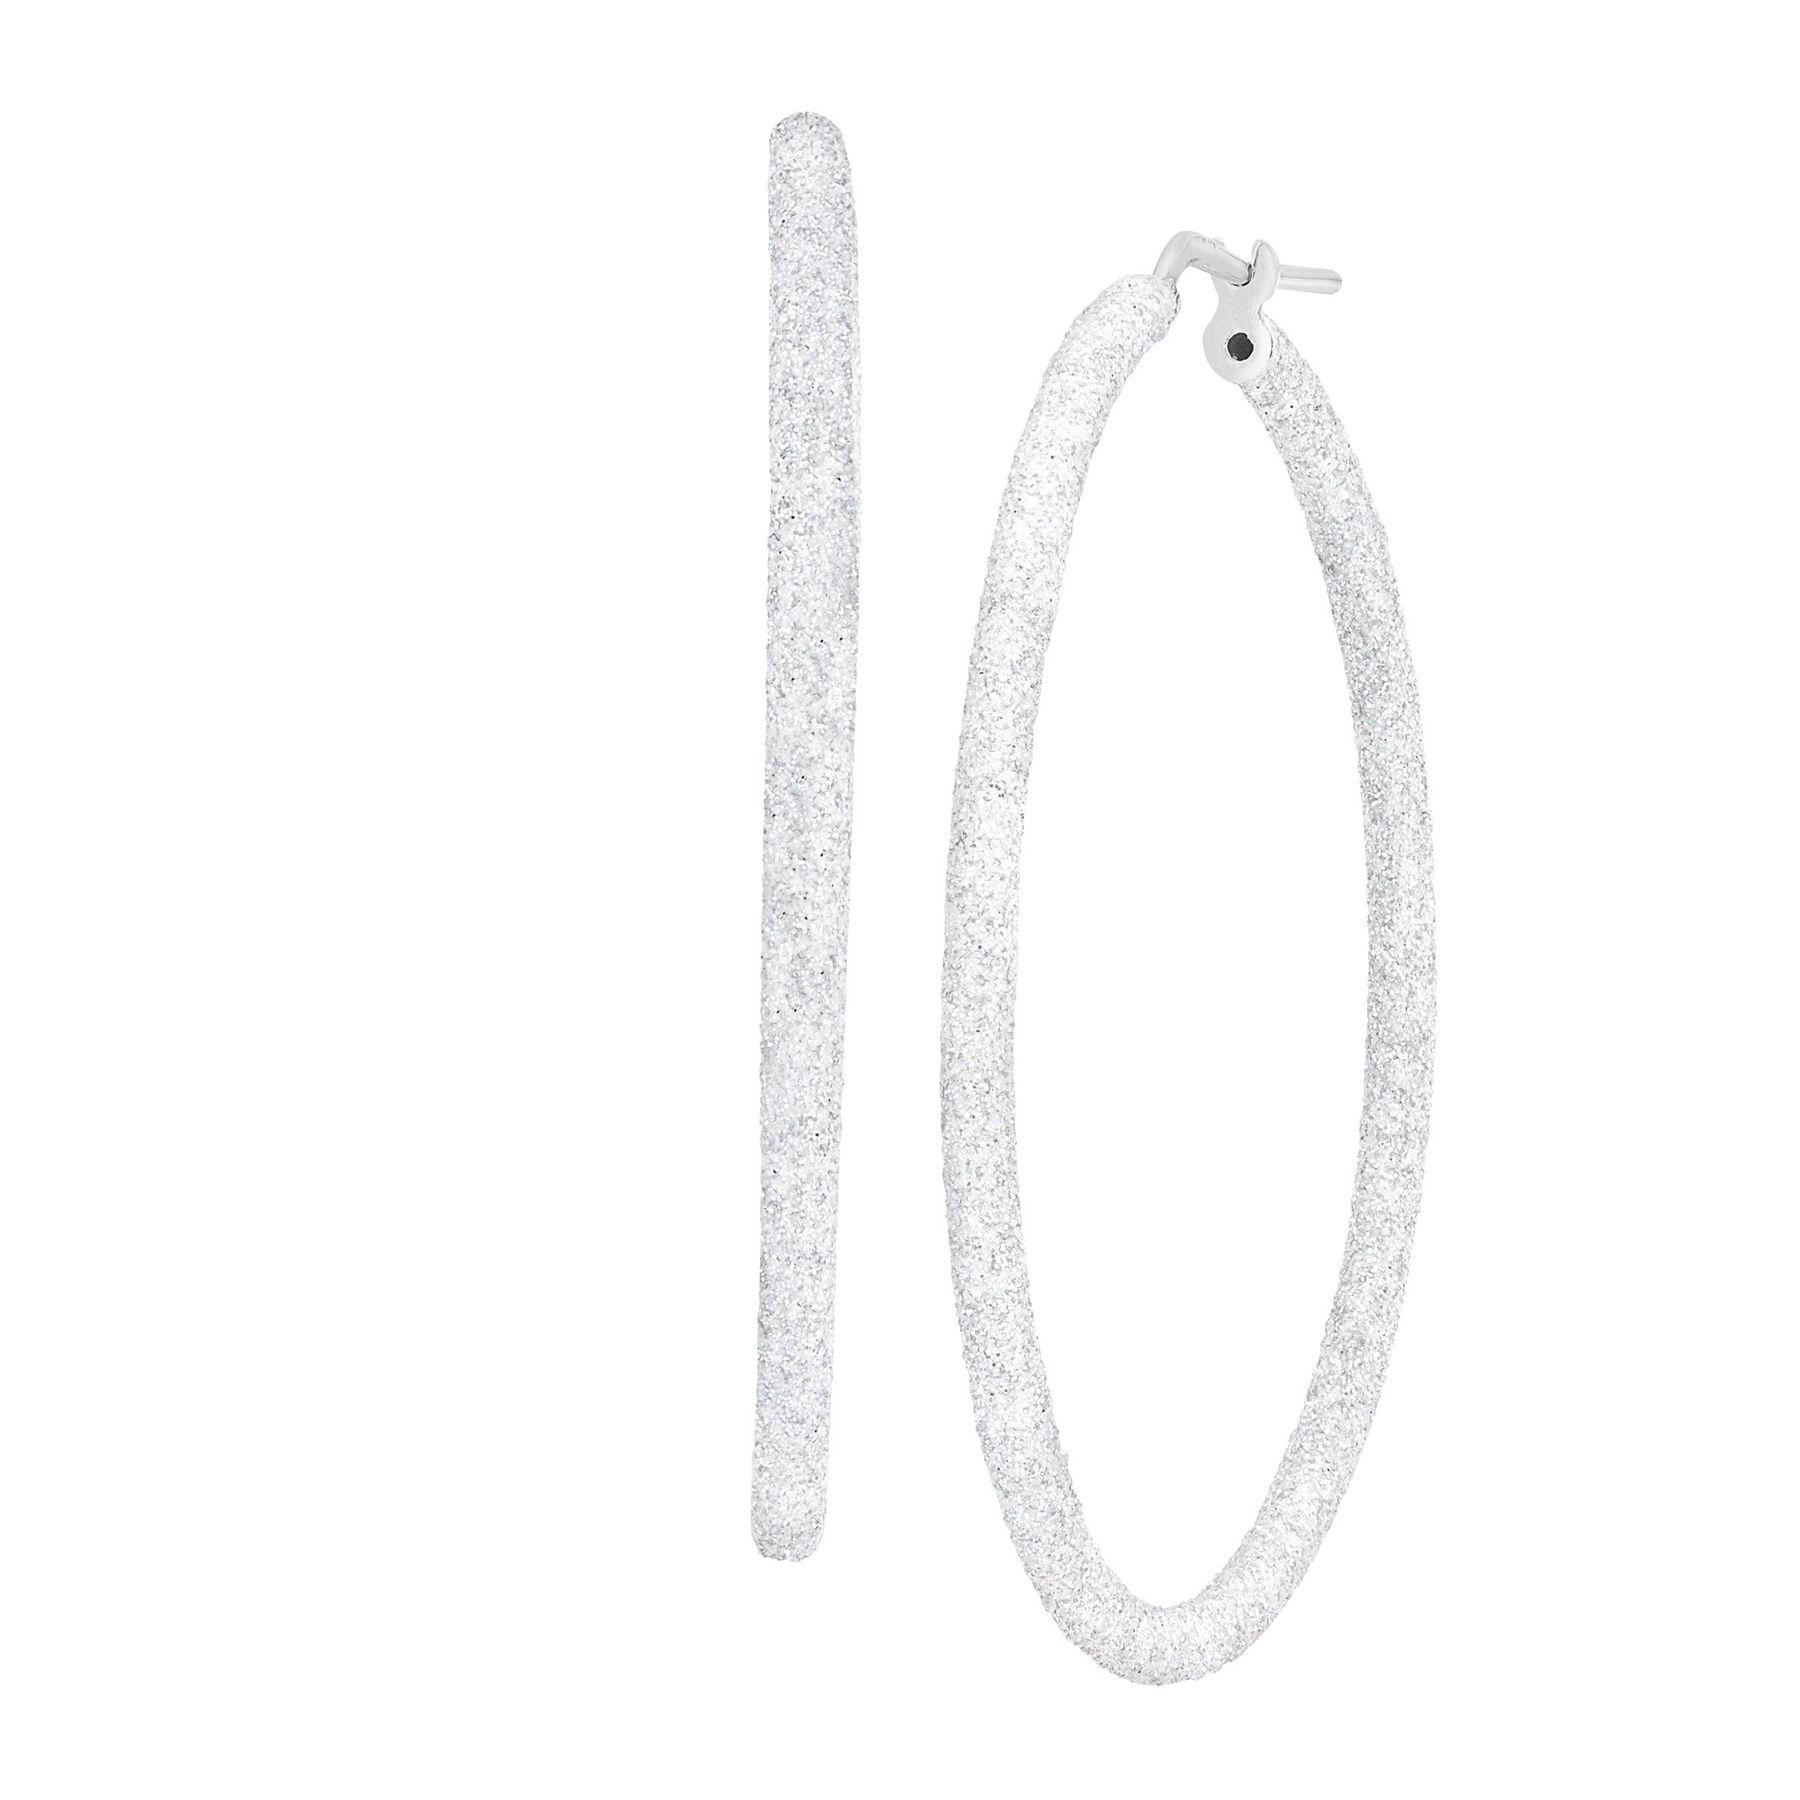 40 Mm Round Glitter Hoop Earrings